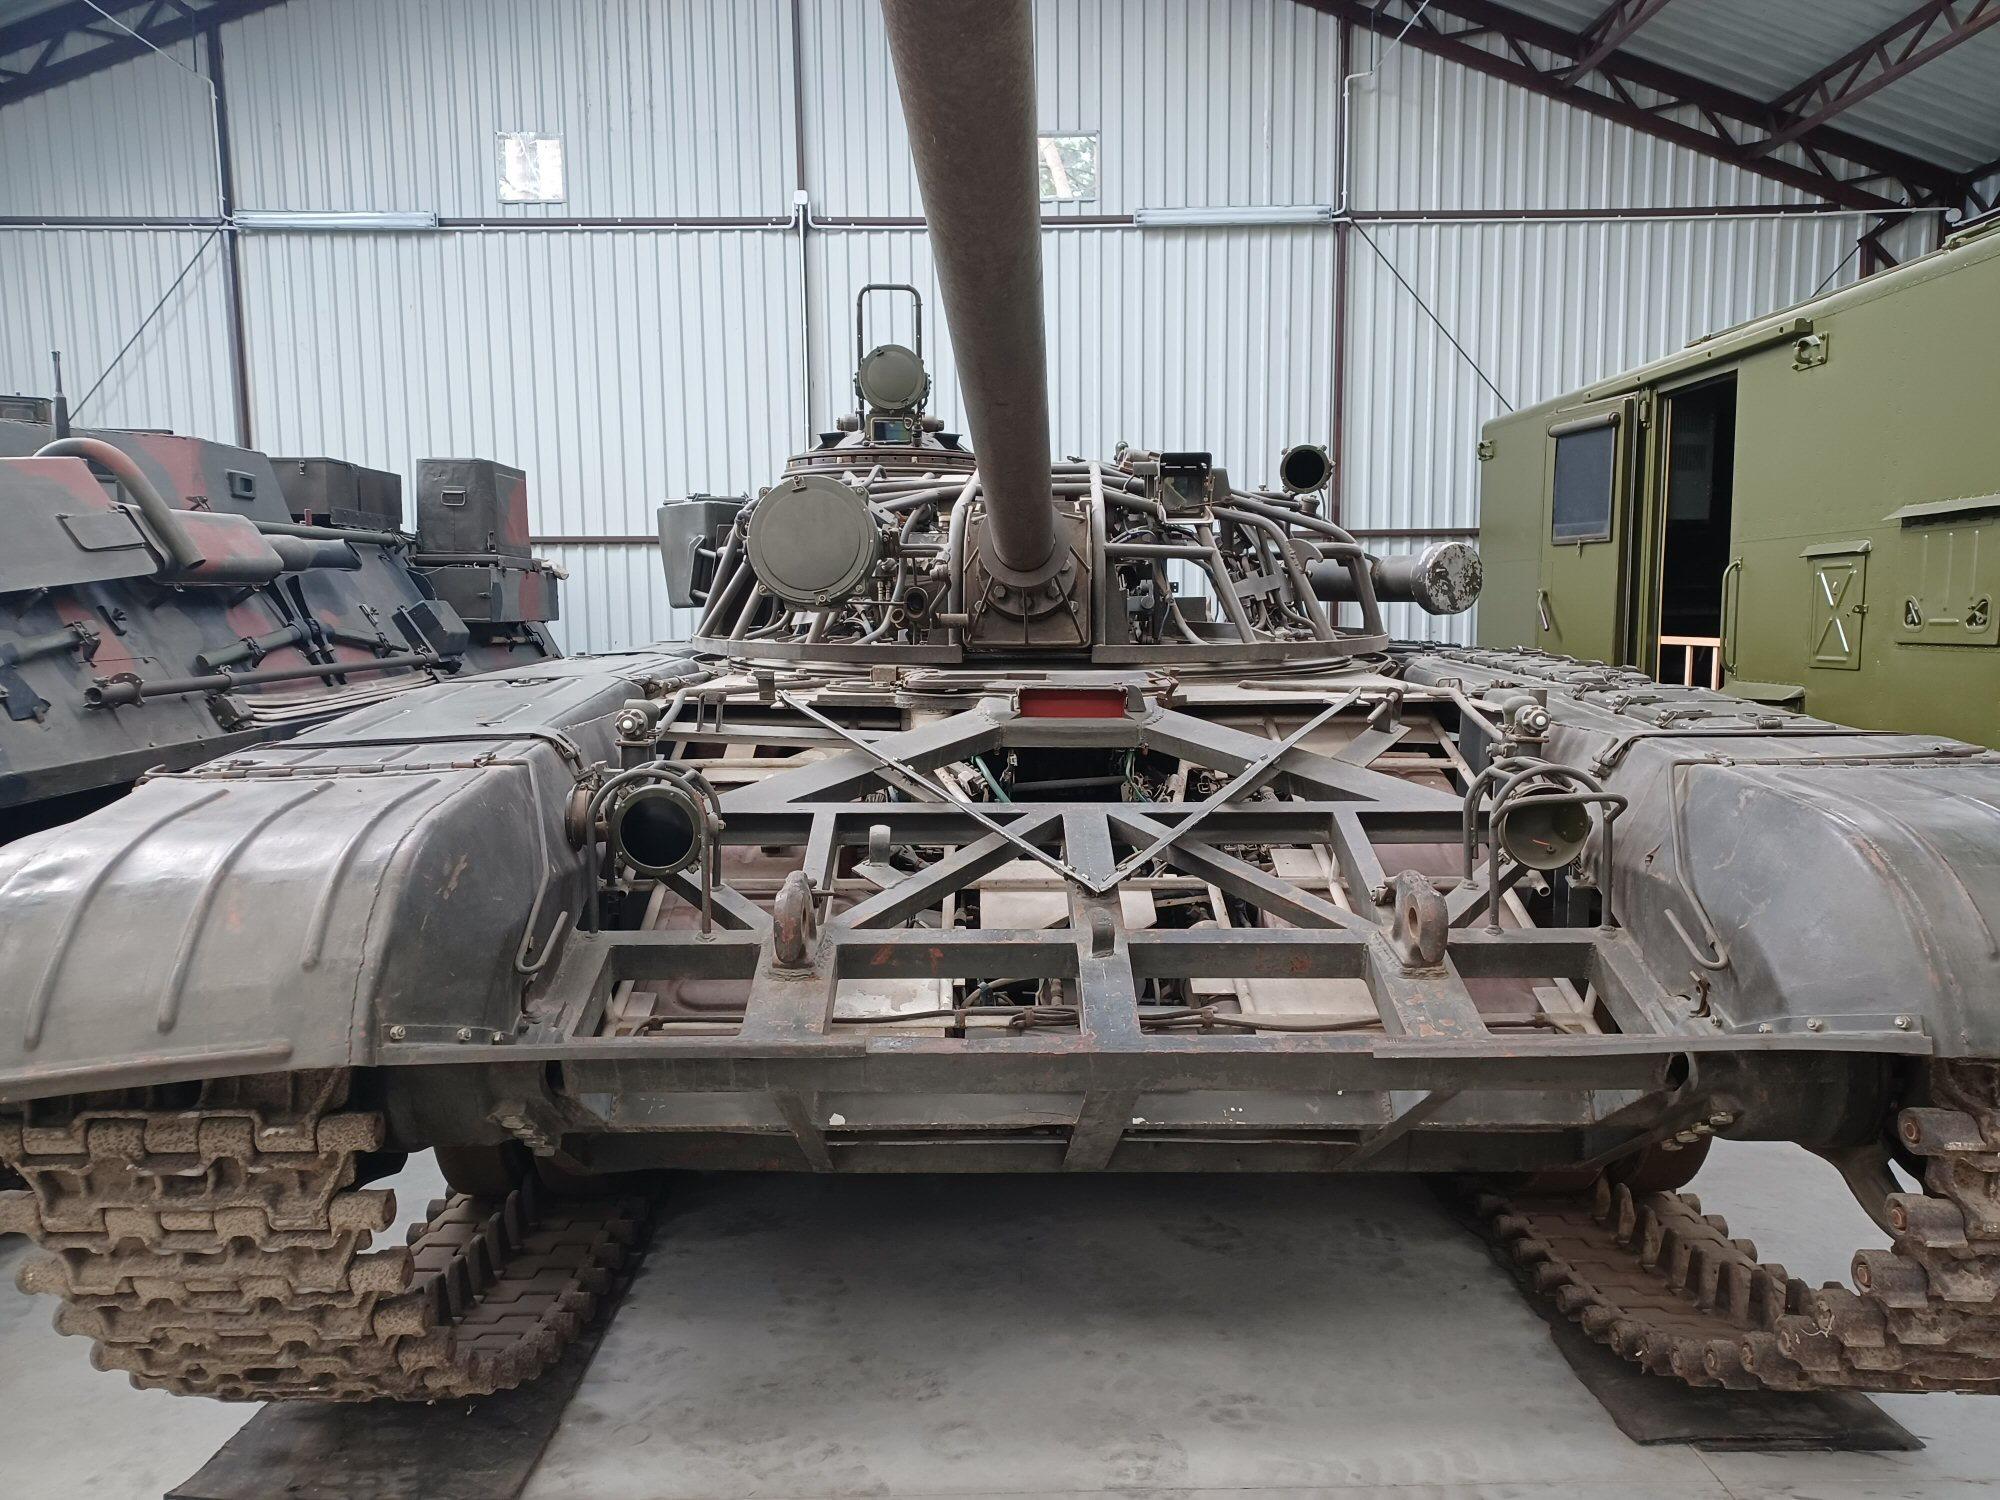 Museum of Military Technology GRYF, Dabrowka, Poland